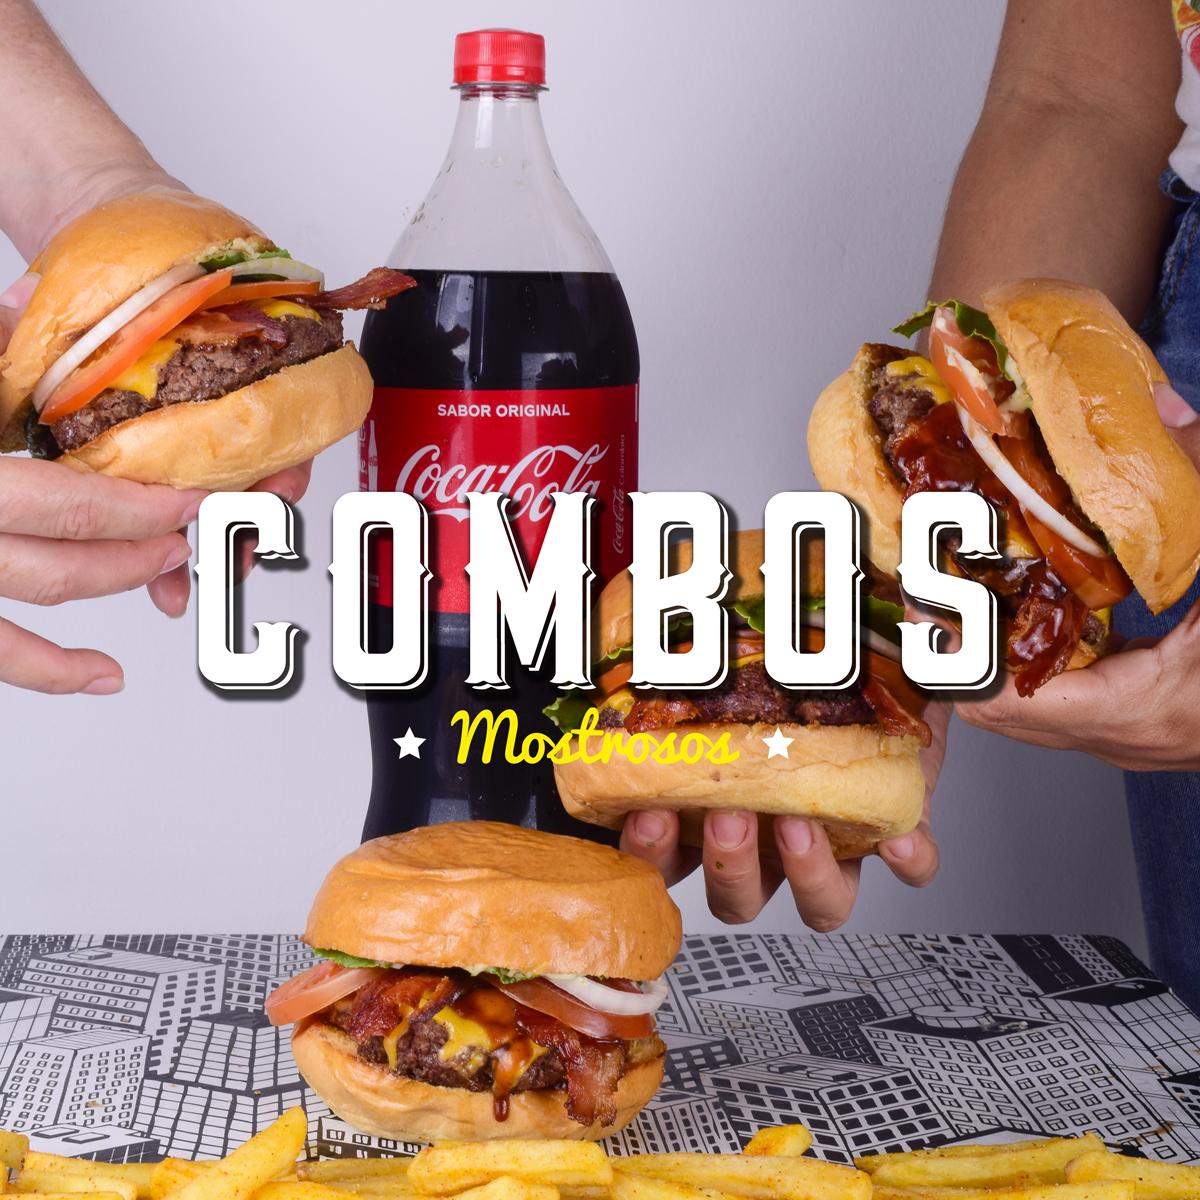 Mostro Burgers